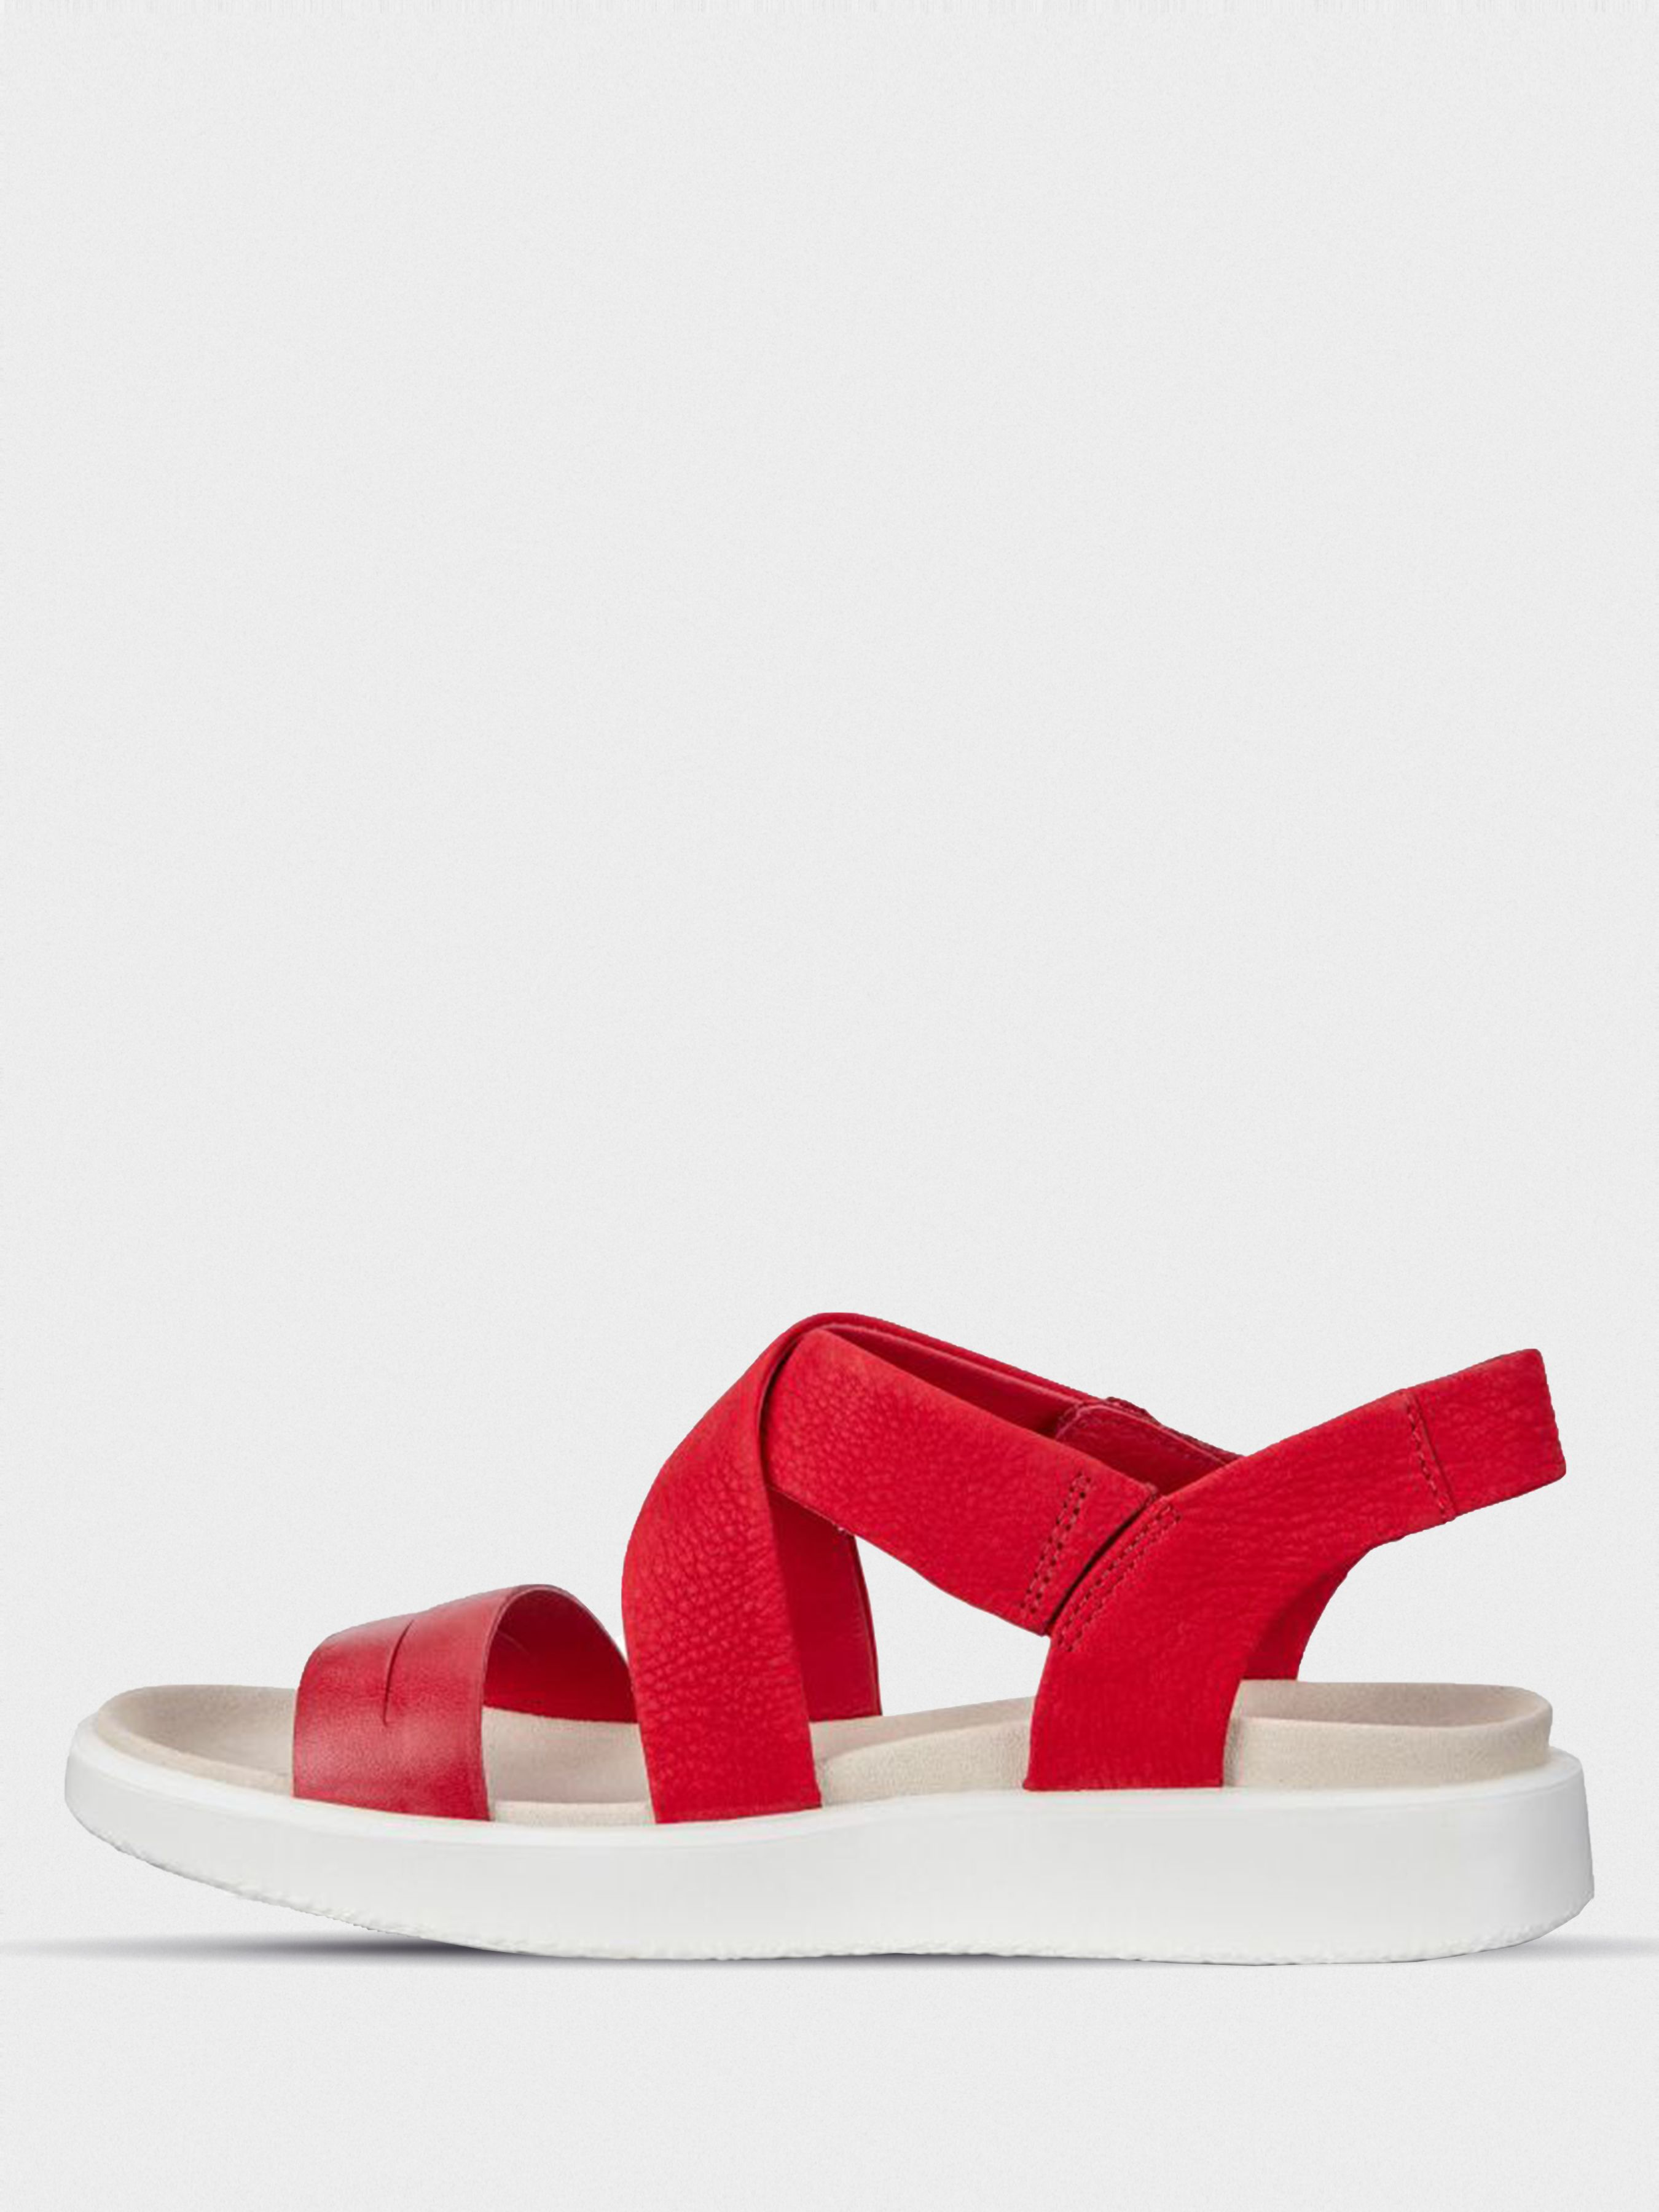 Сандалии для женщин ECCO FLOWT W ZW6170 купить обувь, 2017